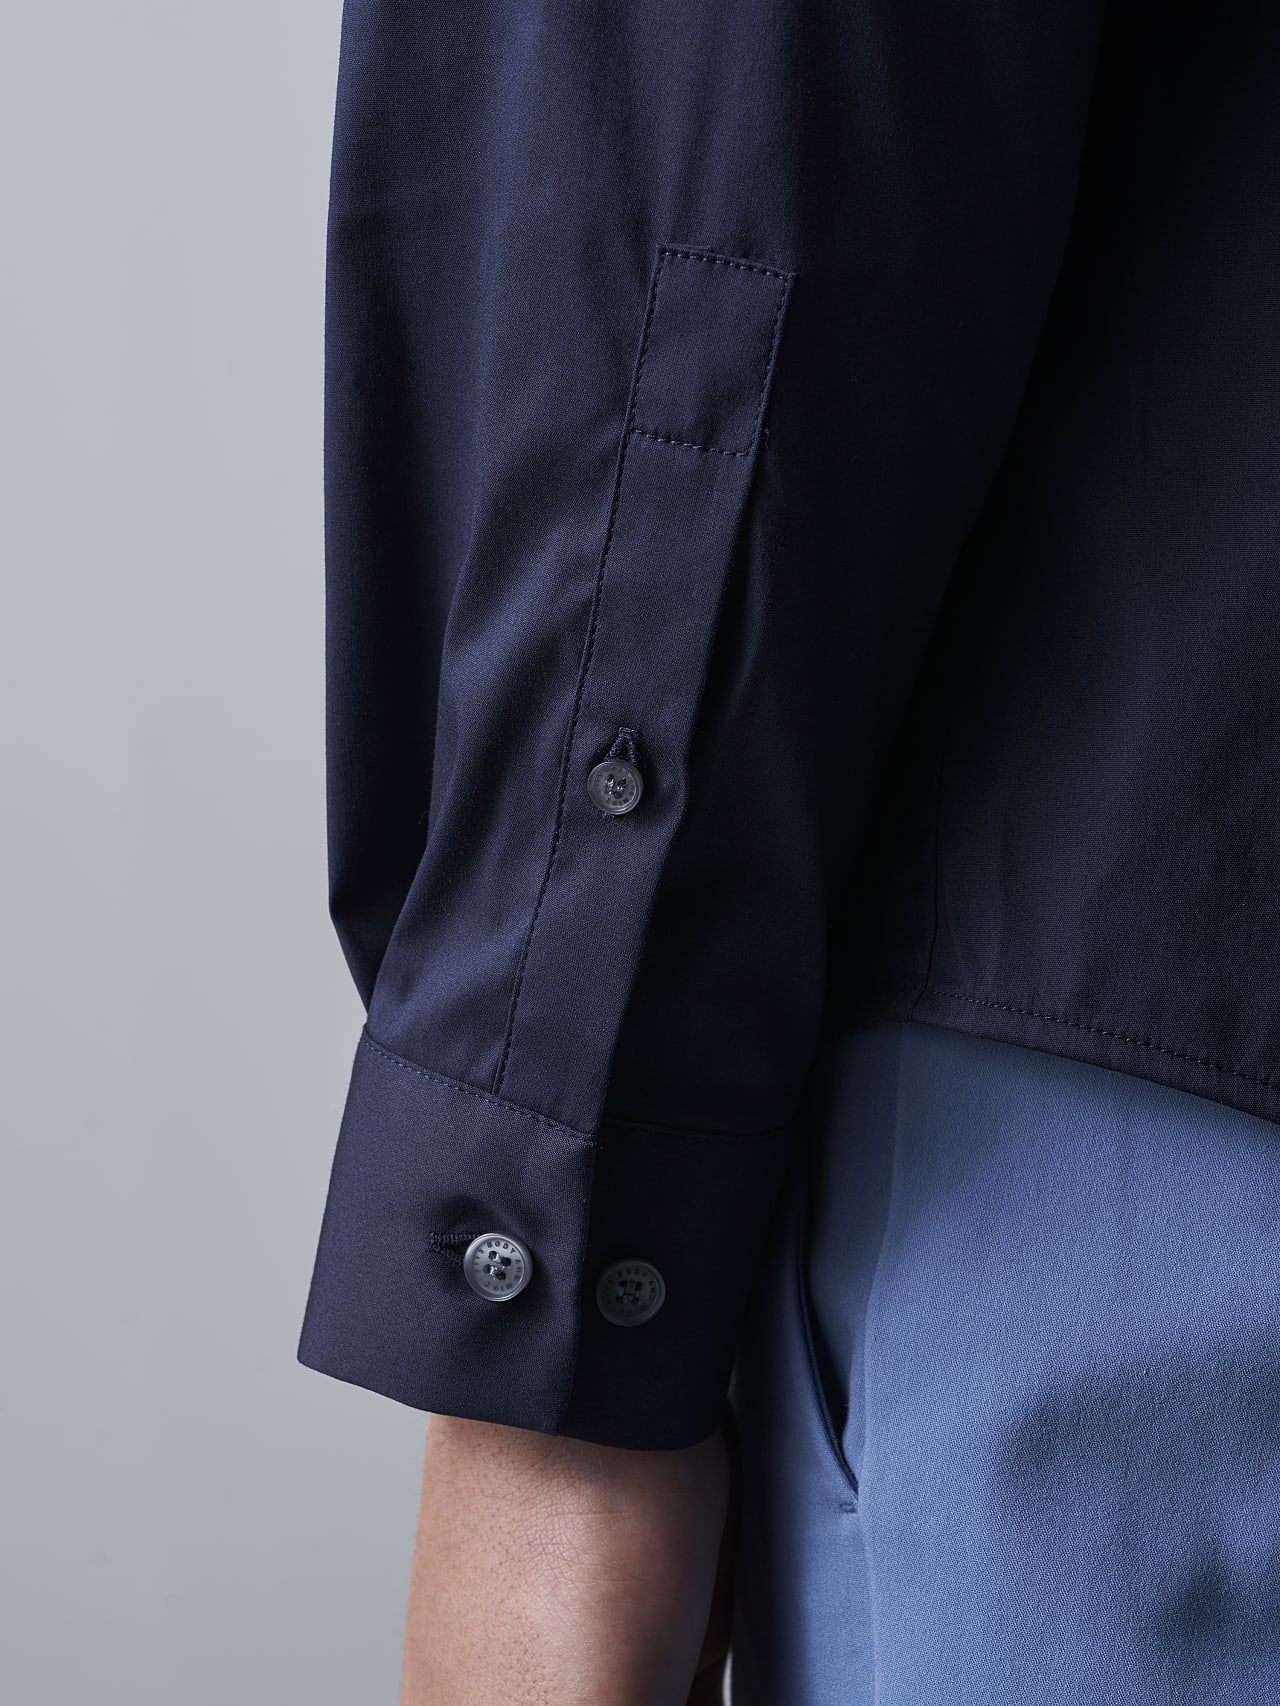 WAARG V2.Y5.02 Easy-Care Cotton Shirt navy Extra Alpha Tauri